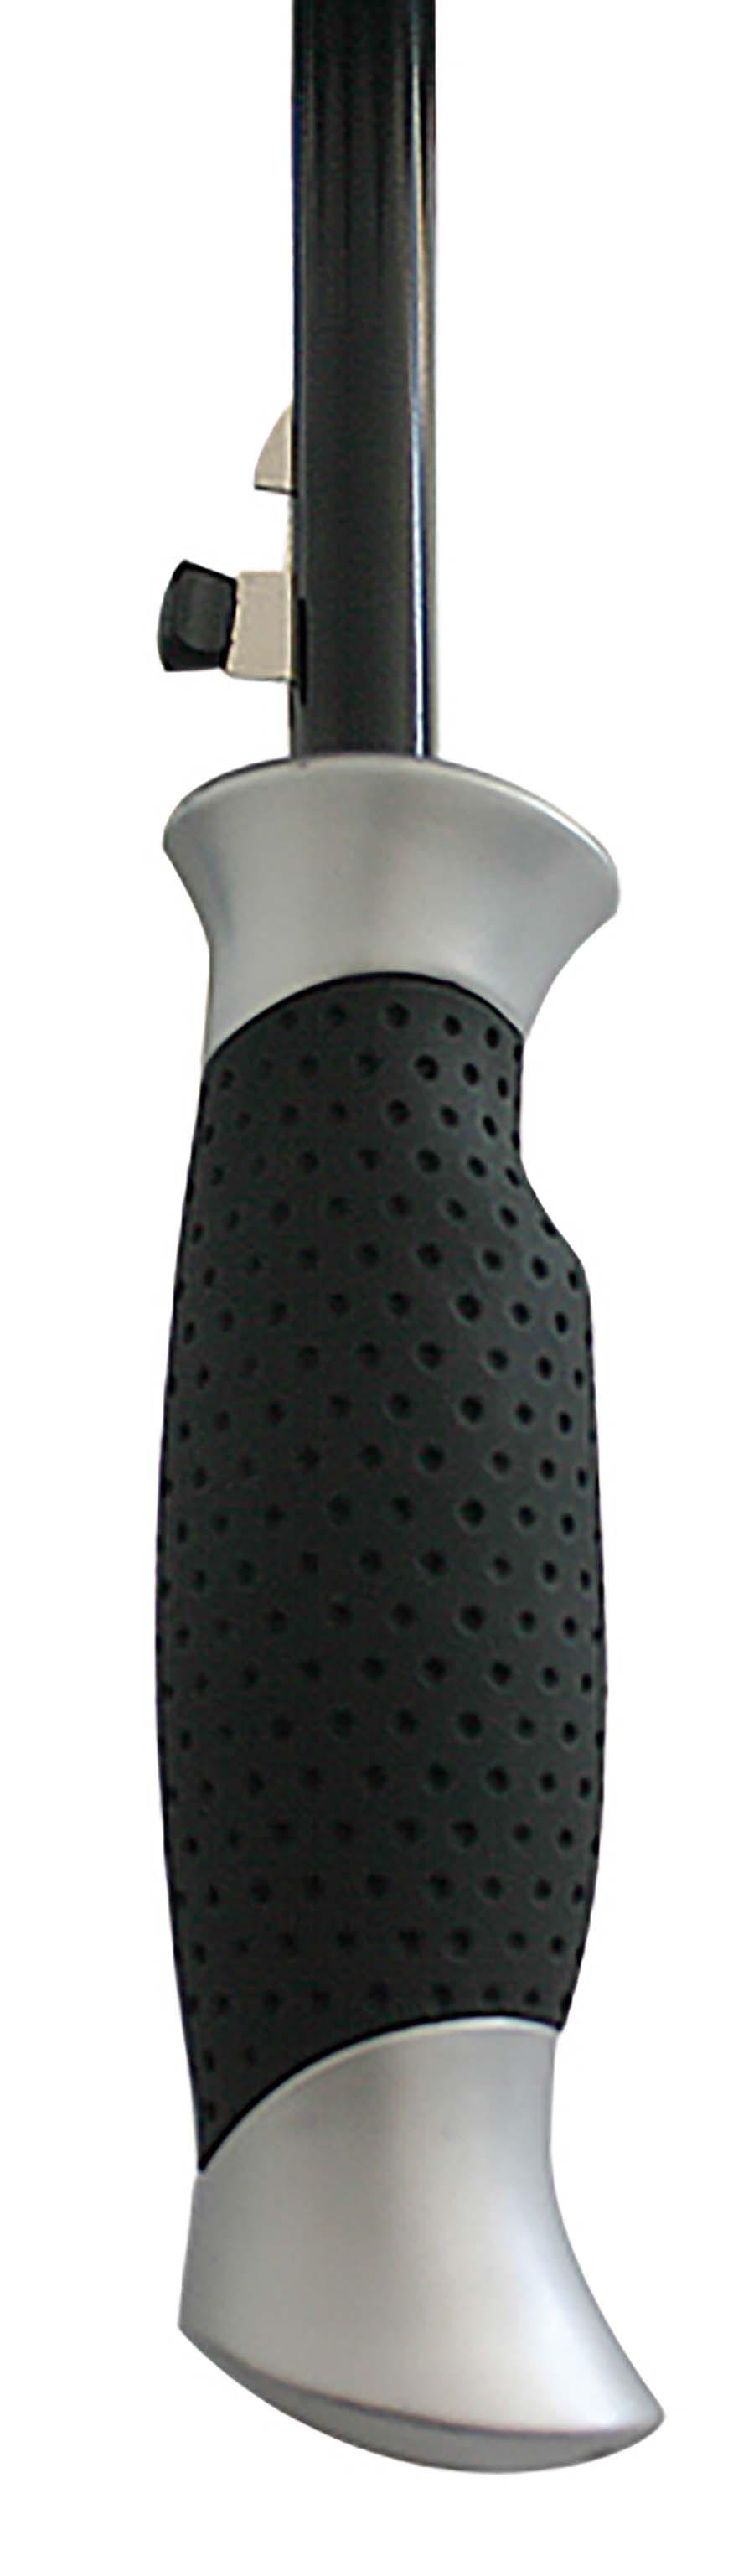 Parapluie Birdy - 13-1016-8